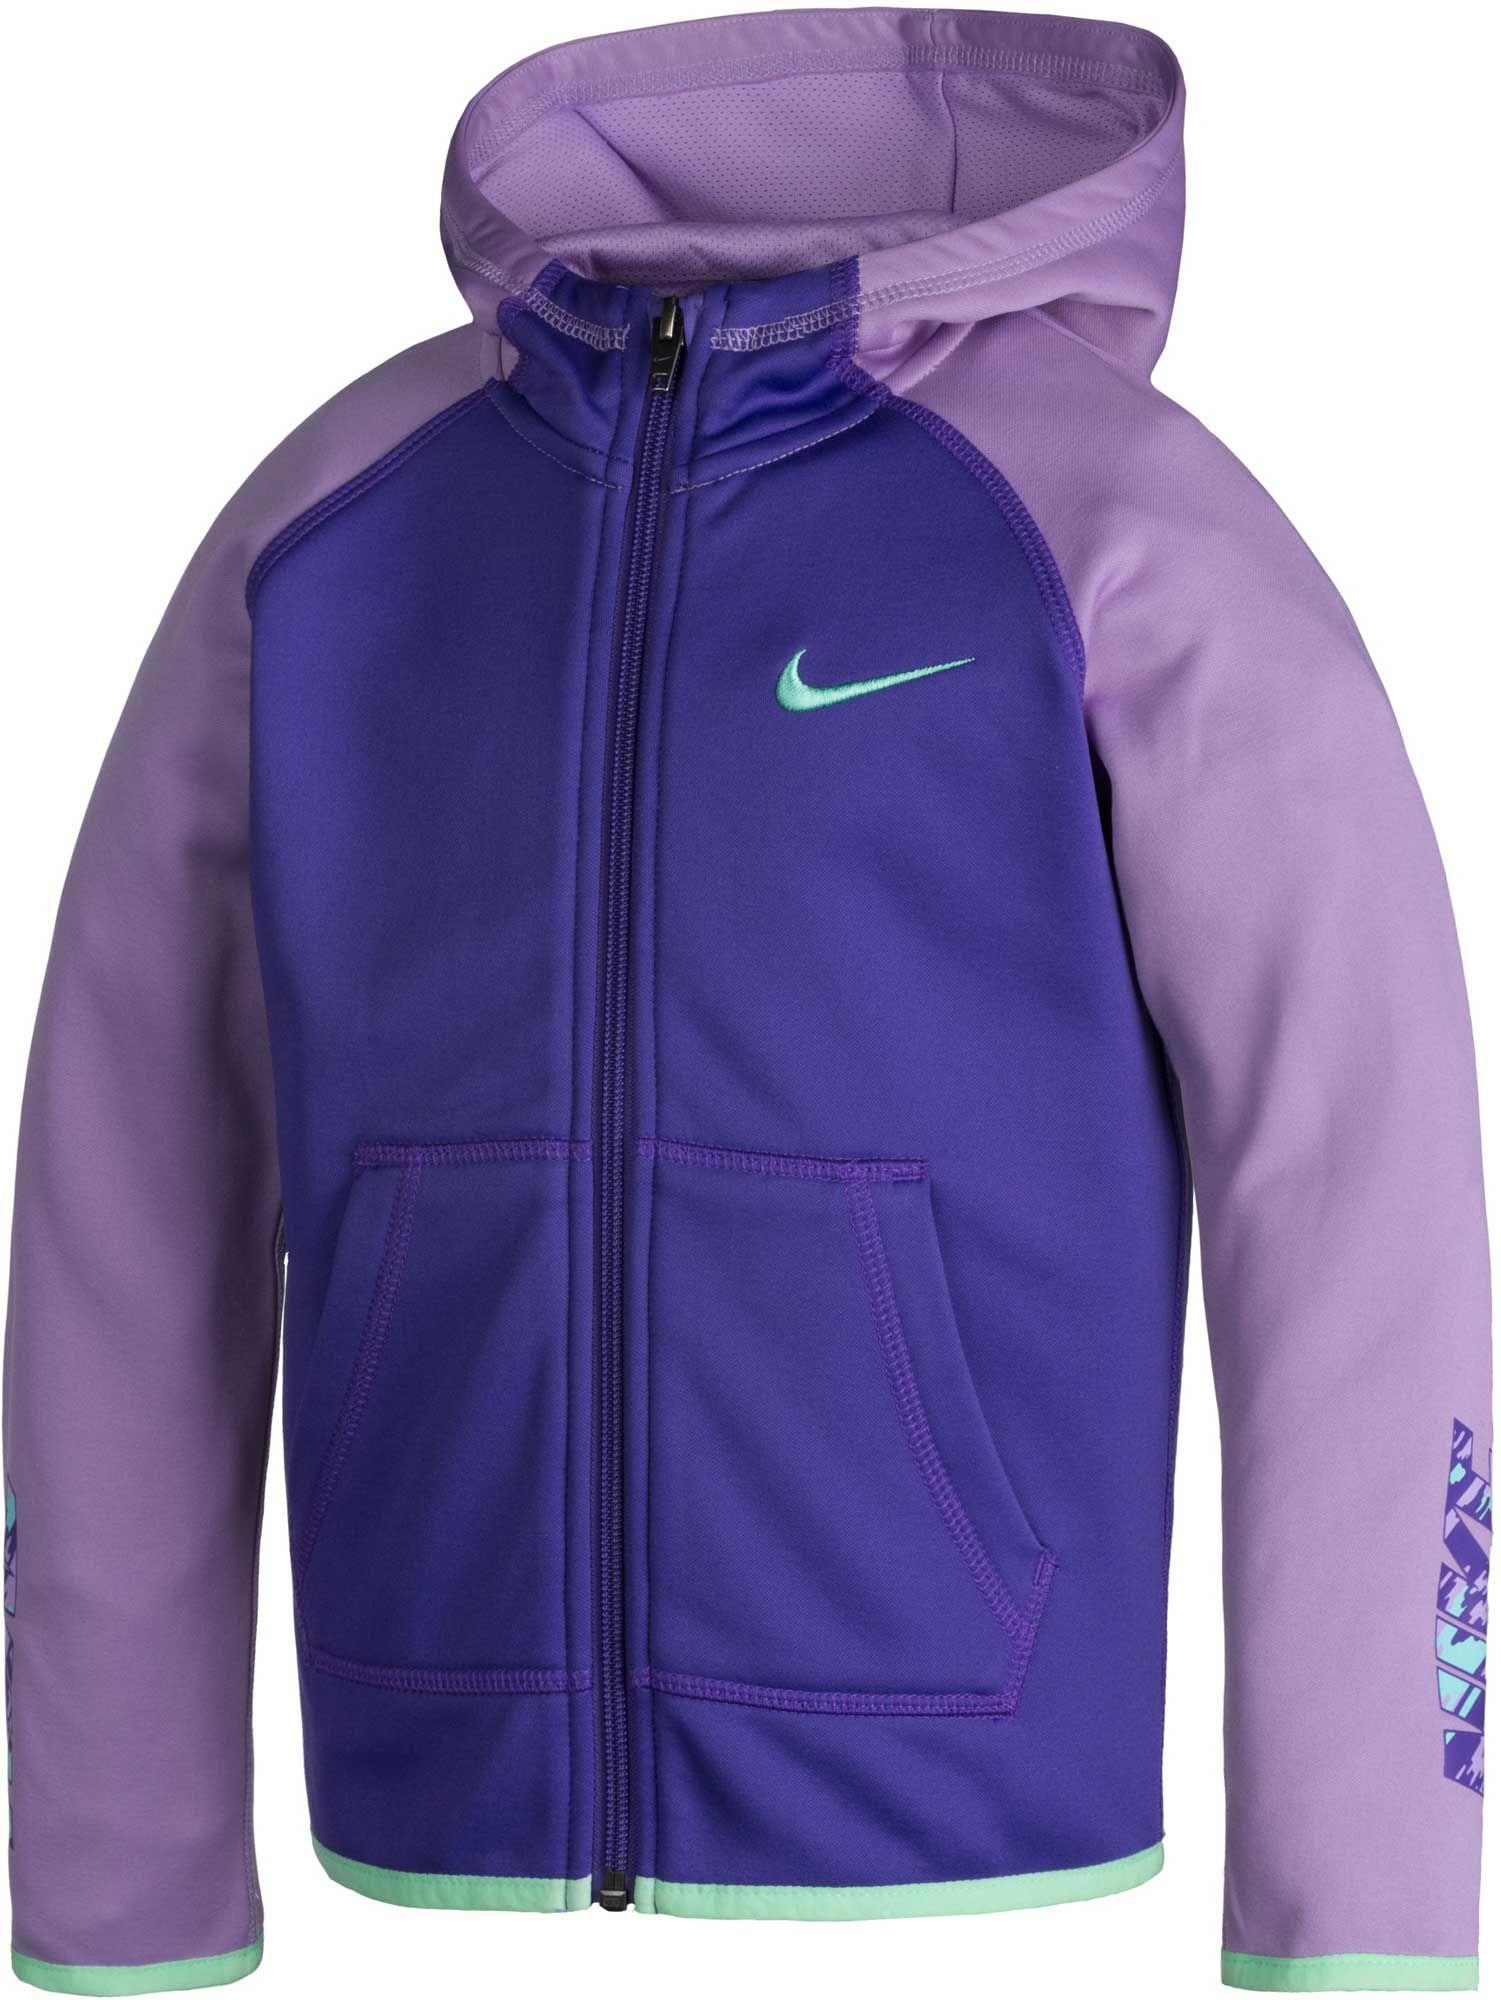 Girls' Hoodies & Sweatshirts | Kids | DICK'S Sporting Goods